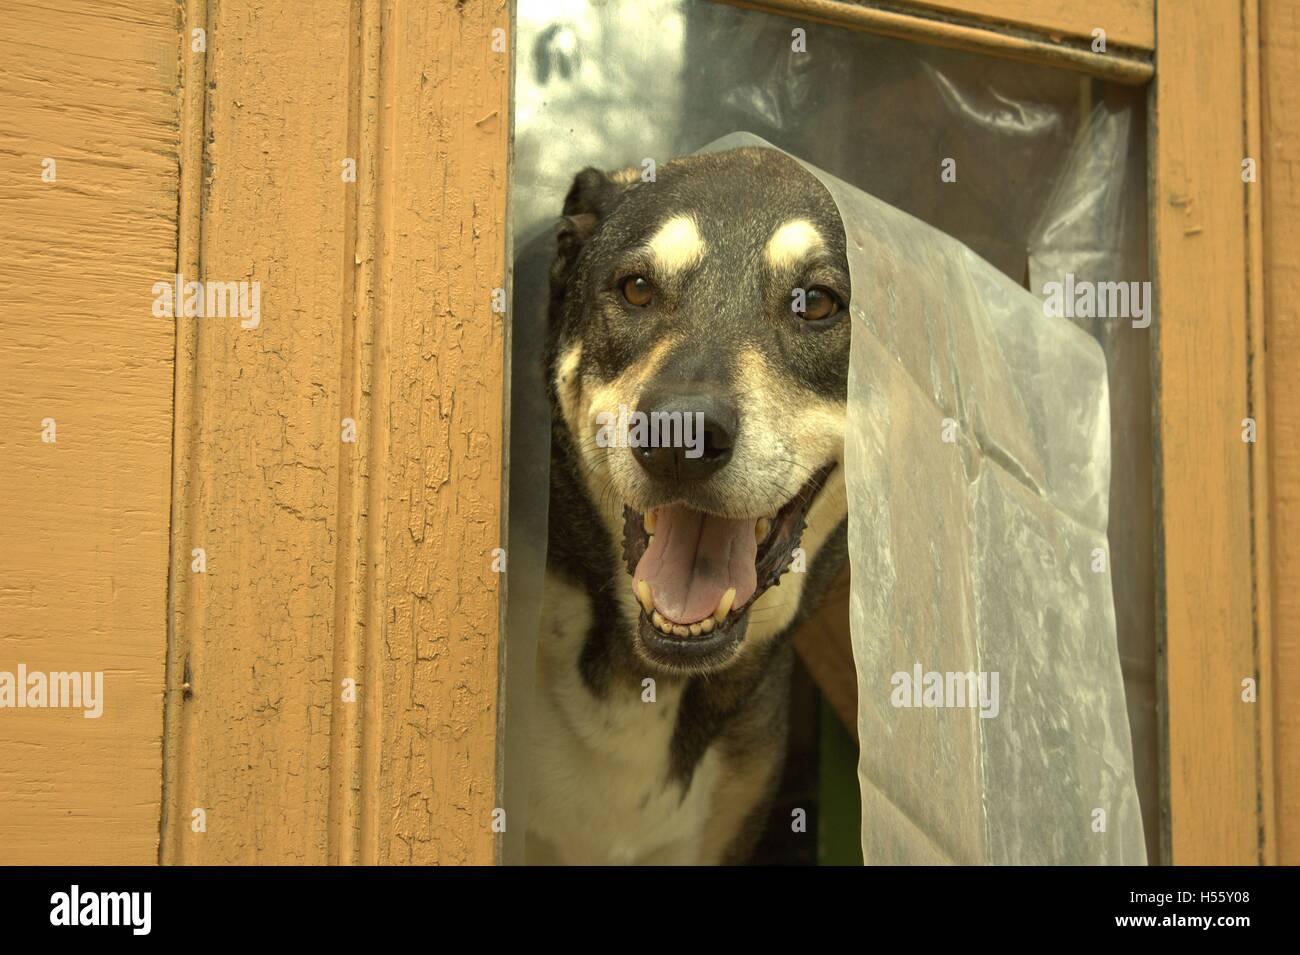 Peeking Out Of Door Stock Photos Peeking Out Of Door Stock Images